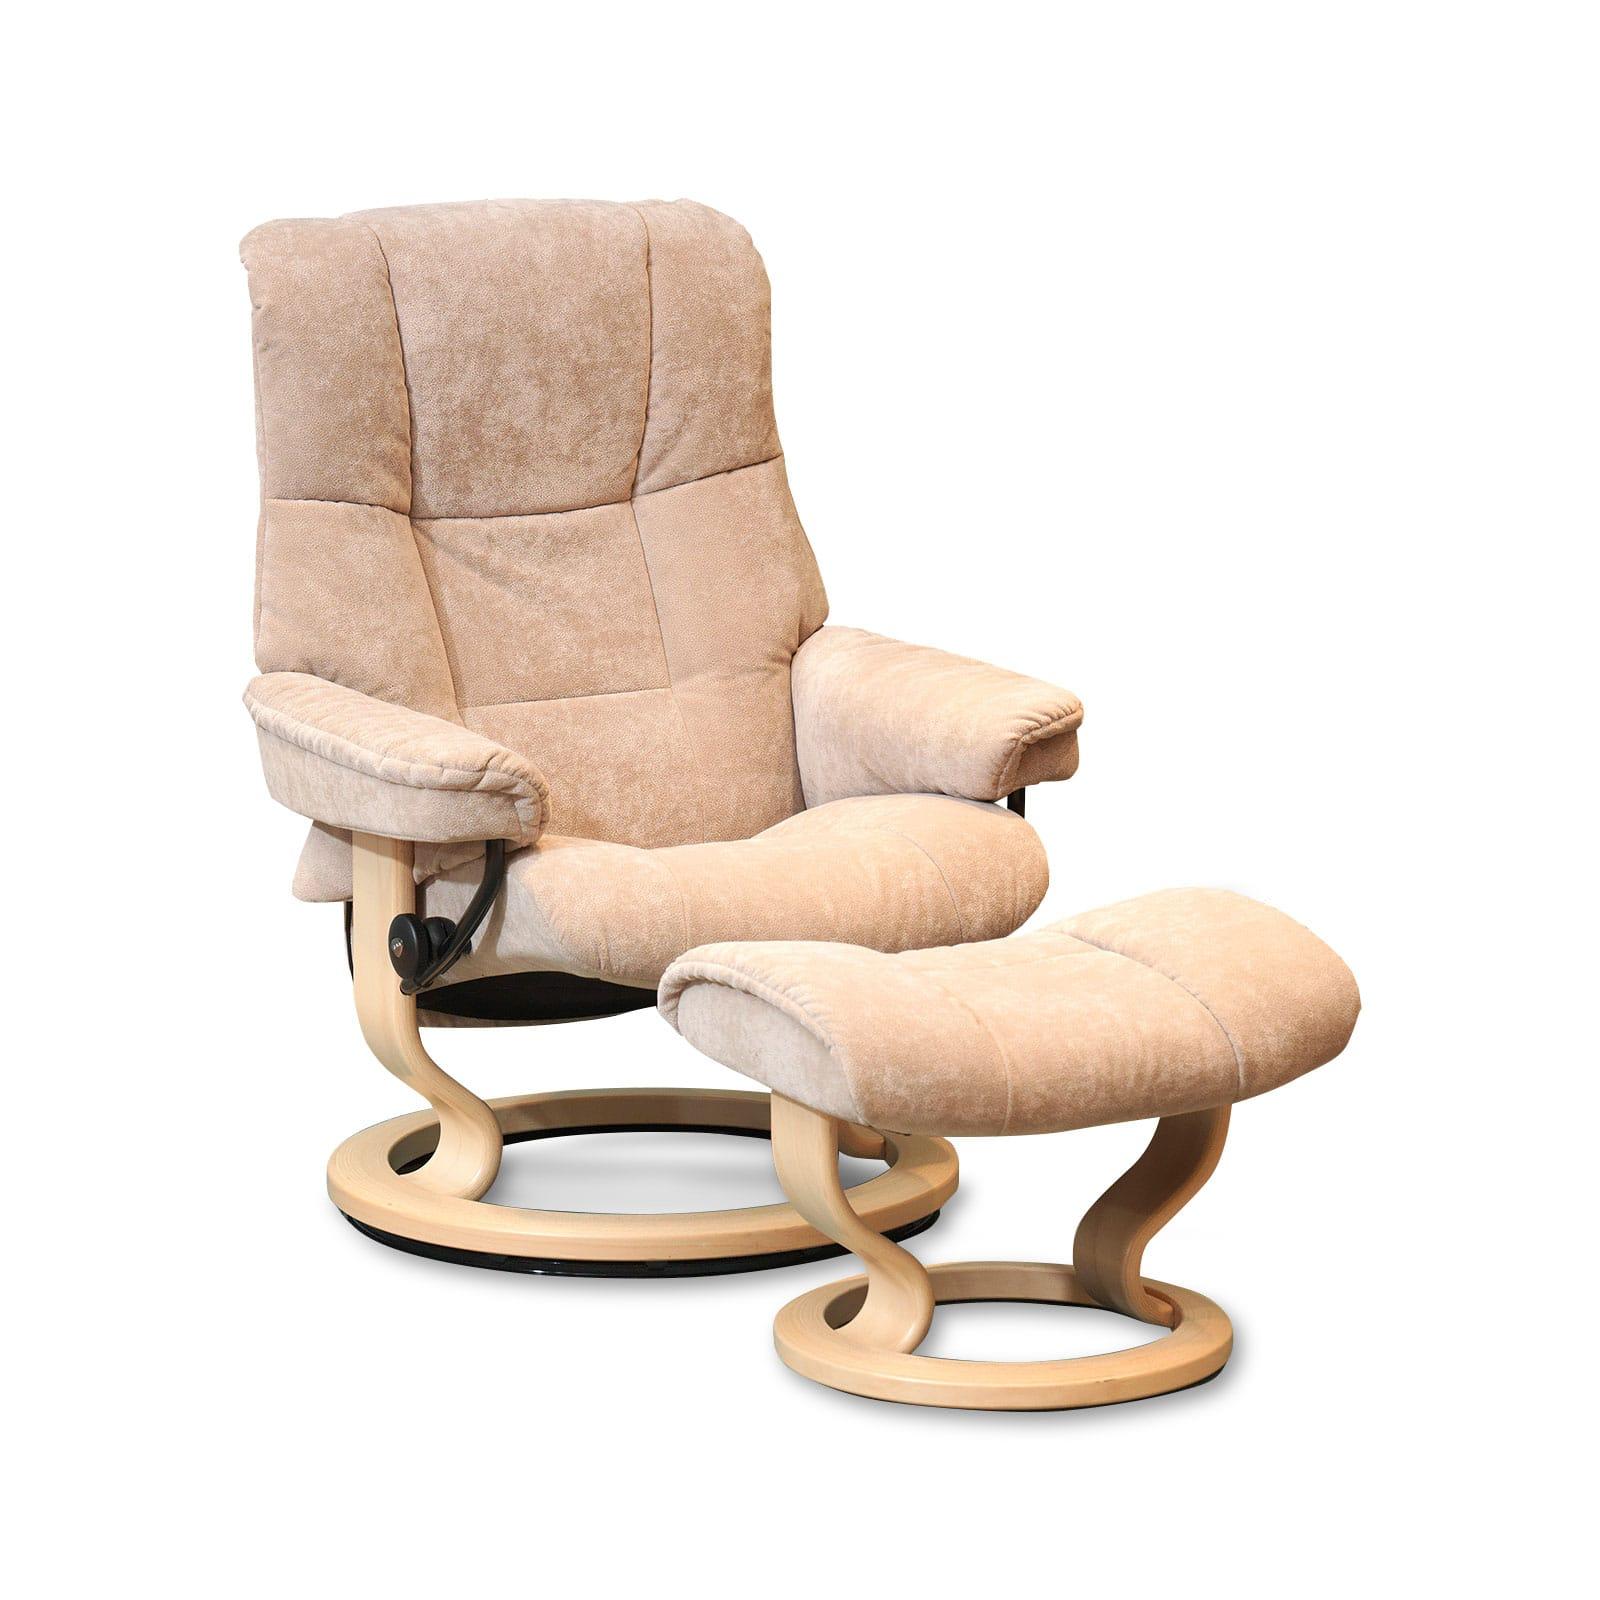 stressless sessel mayfair karma dark beige classic natur. Black Bedroom Furniture Sets. Home Design Ideas